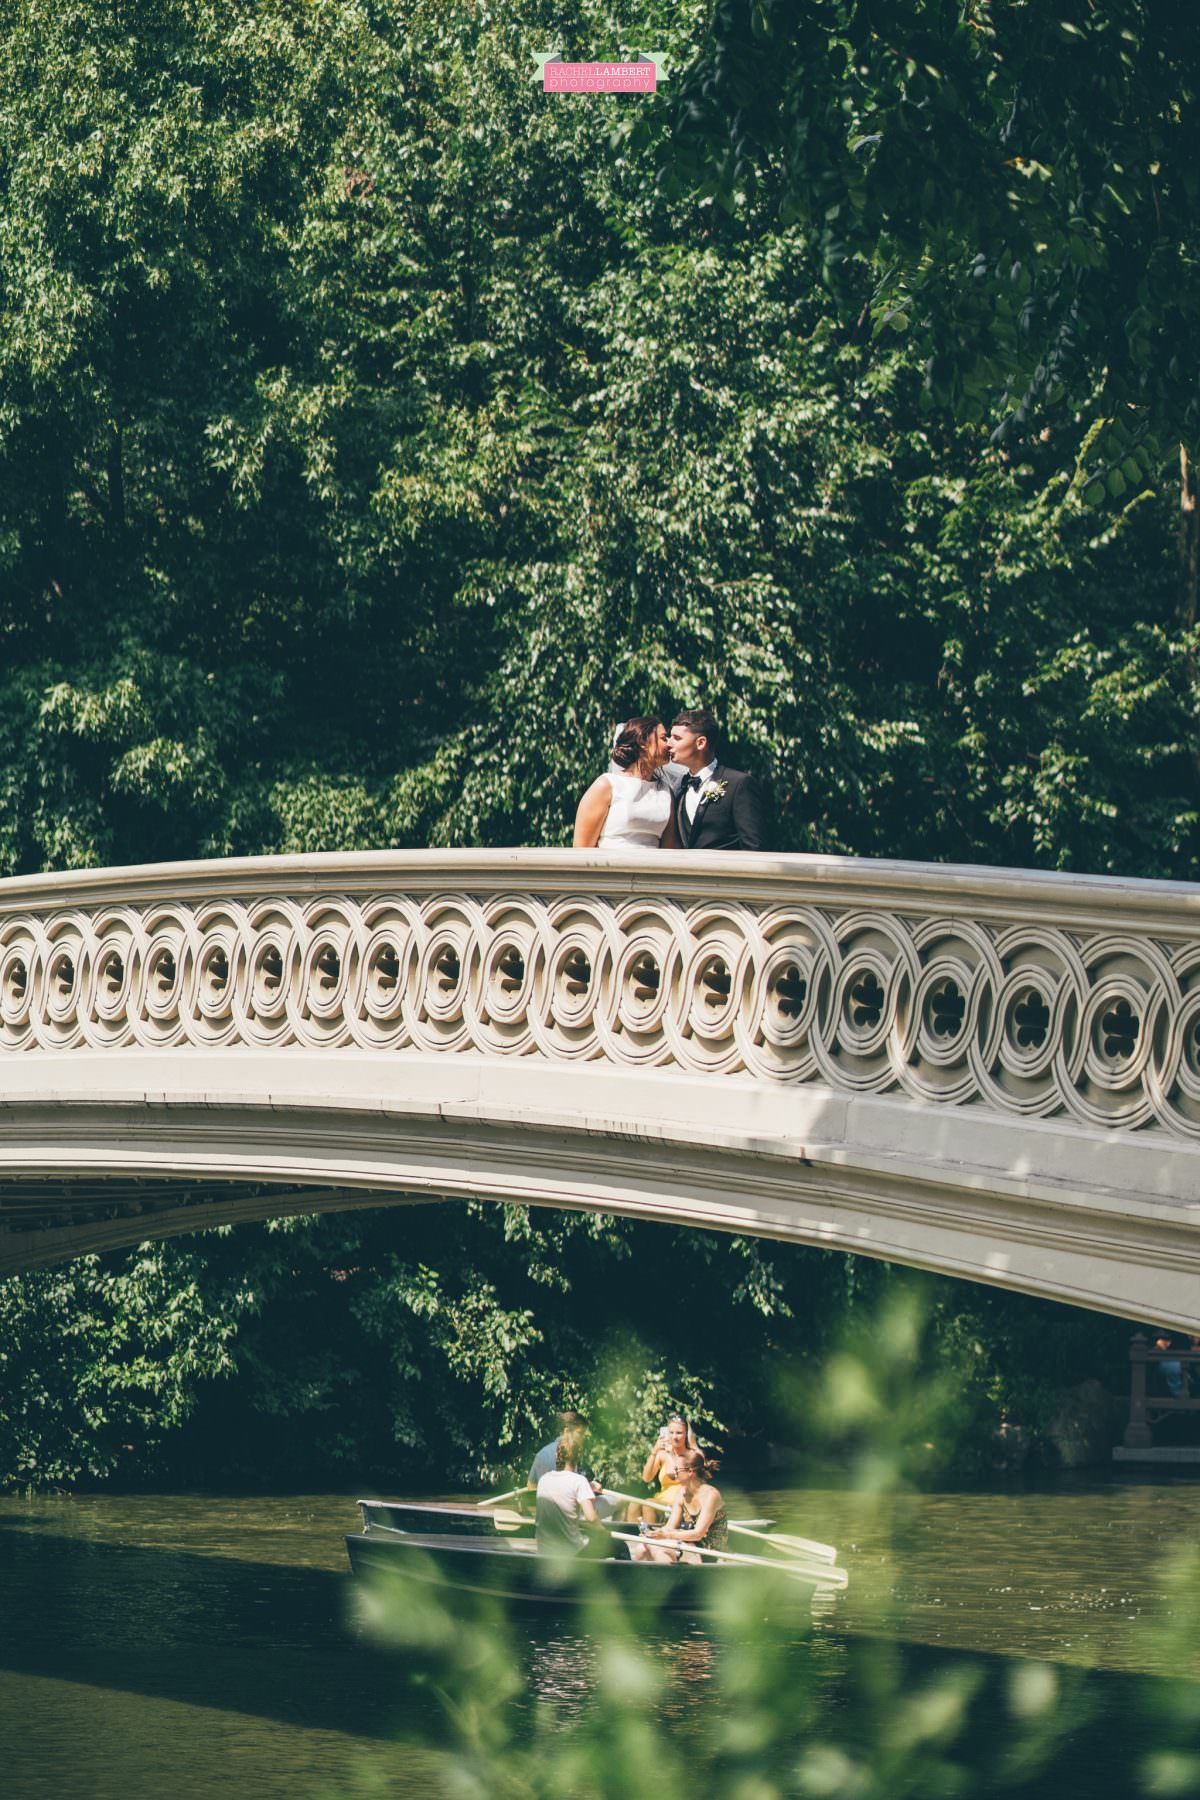 rachel lambert photography new york wedding photos bride and groom central park bow bridge